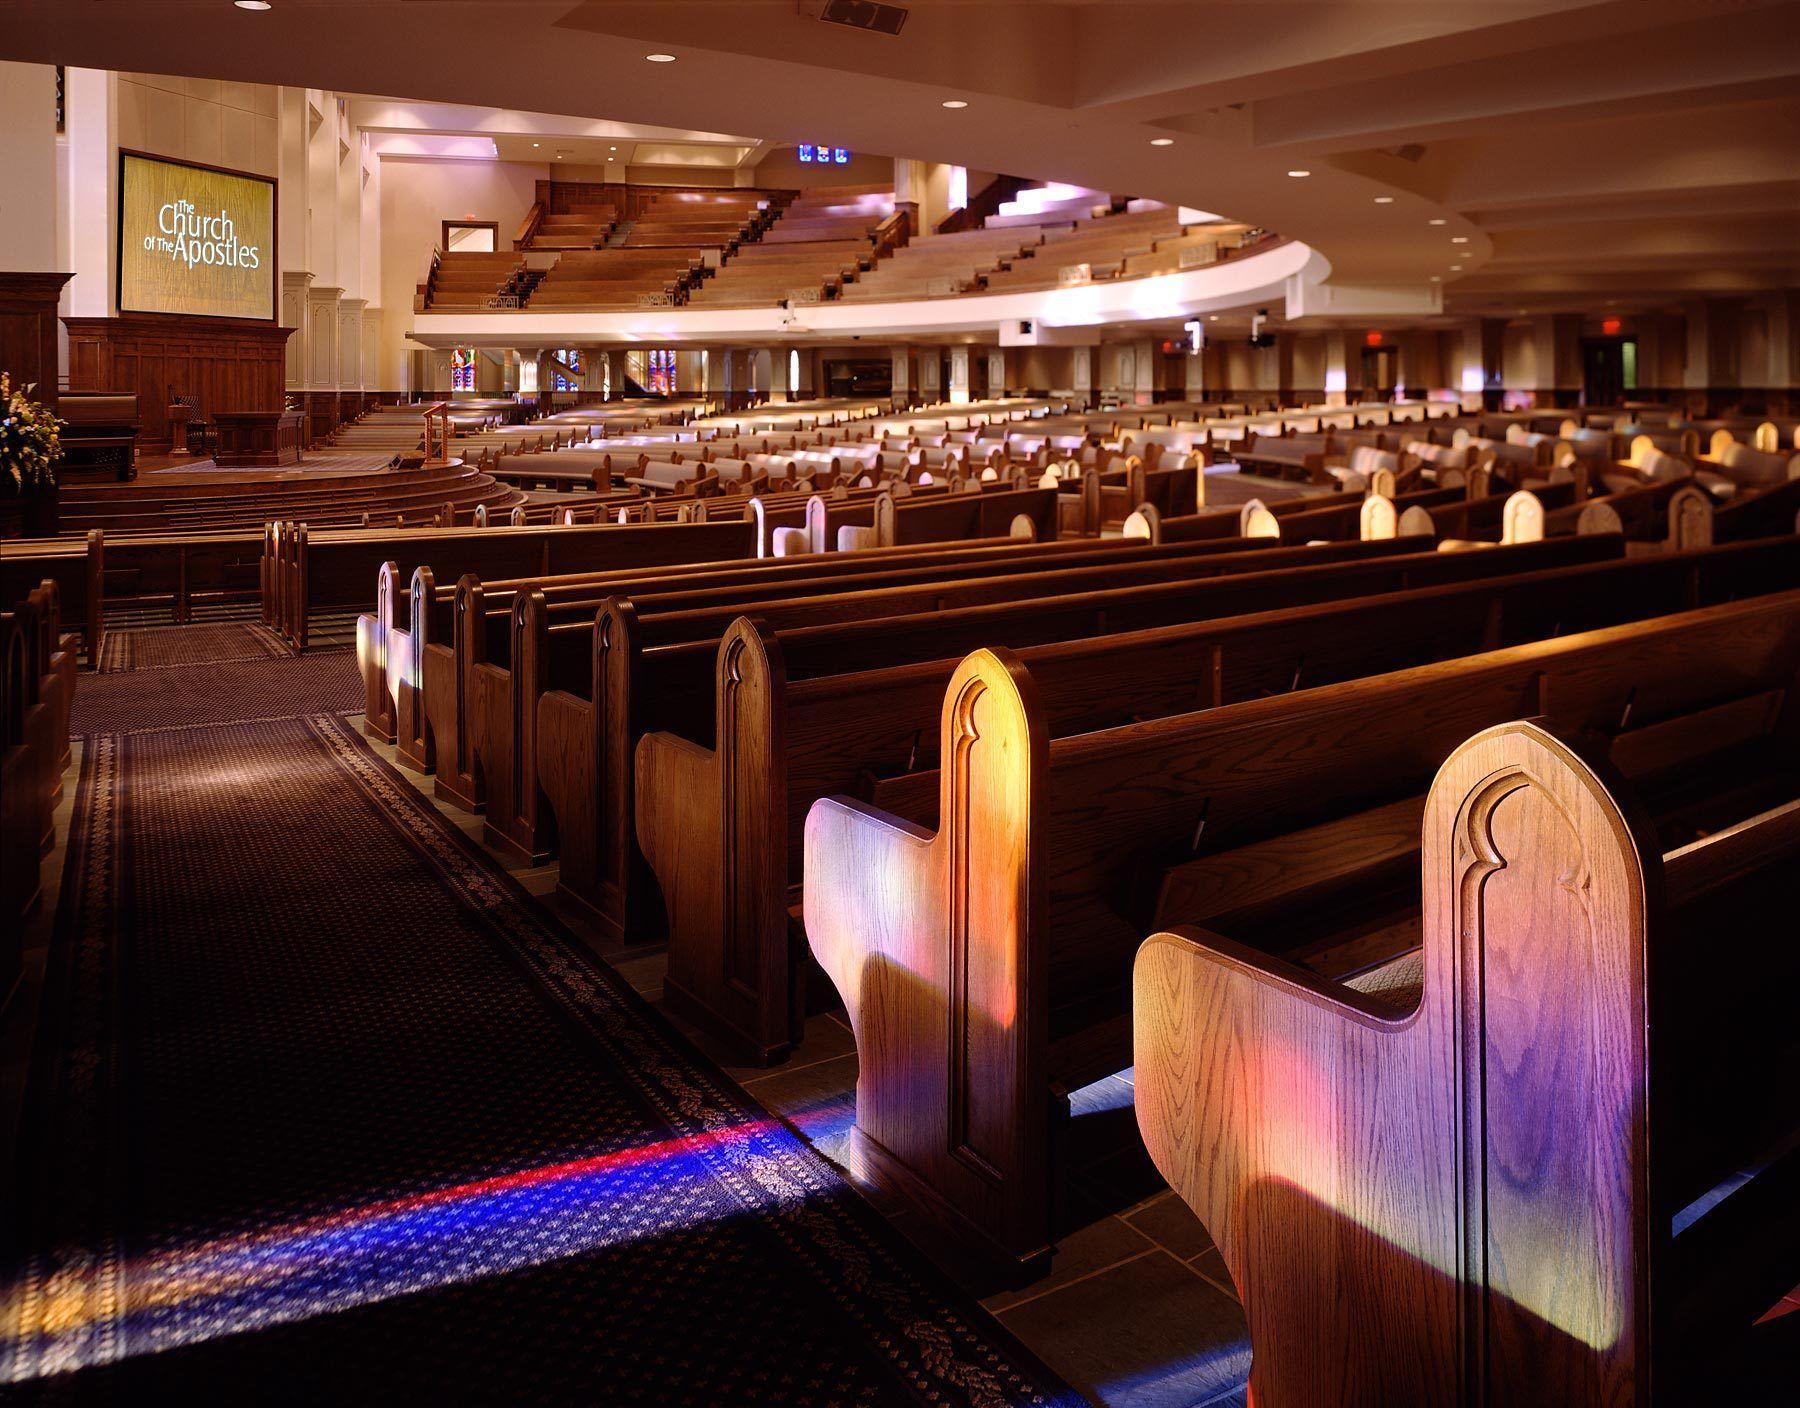 Church of the Apostles, Atlanta, GA.